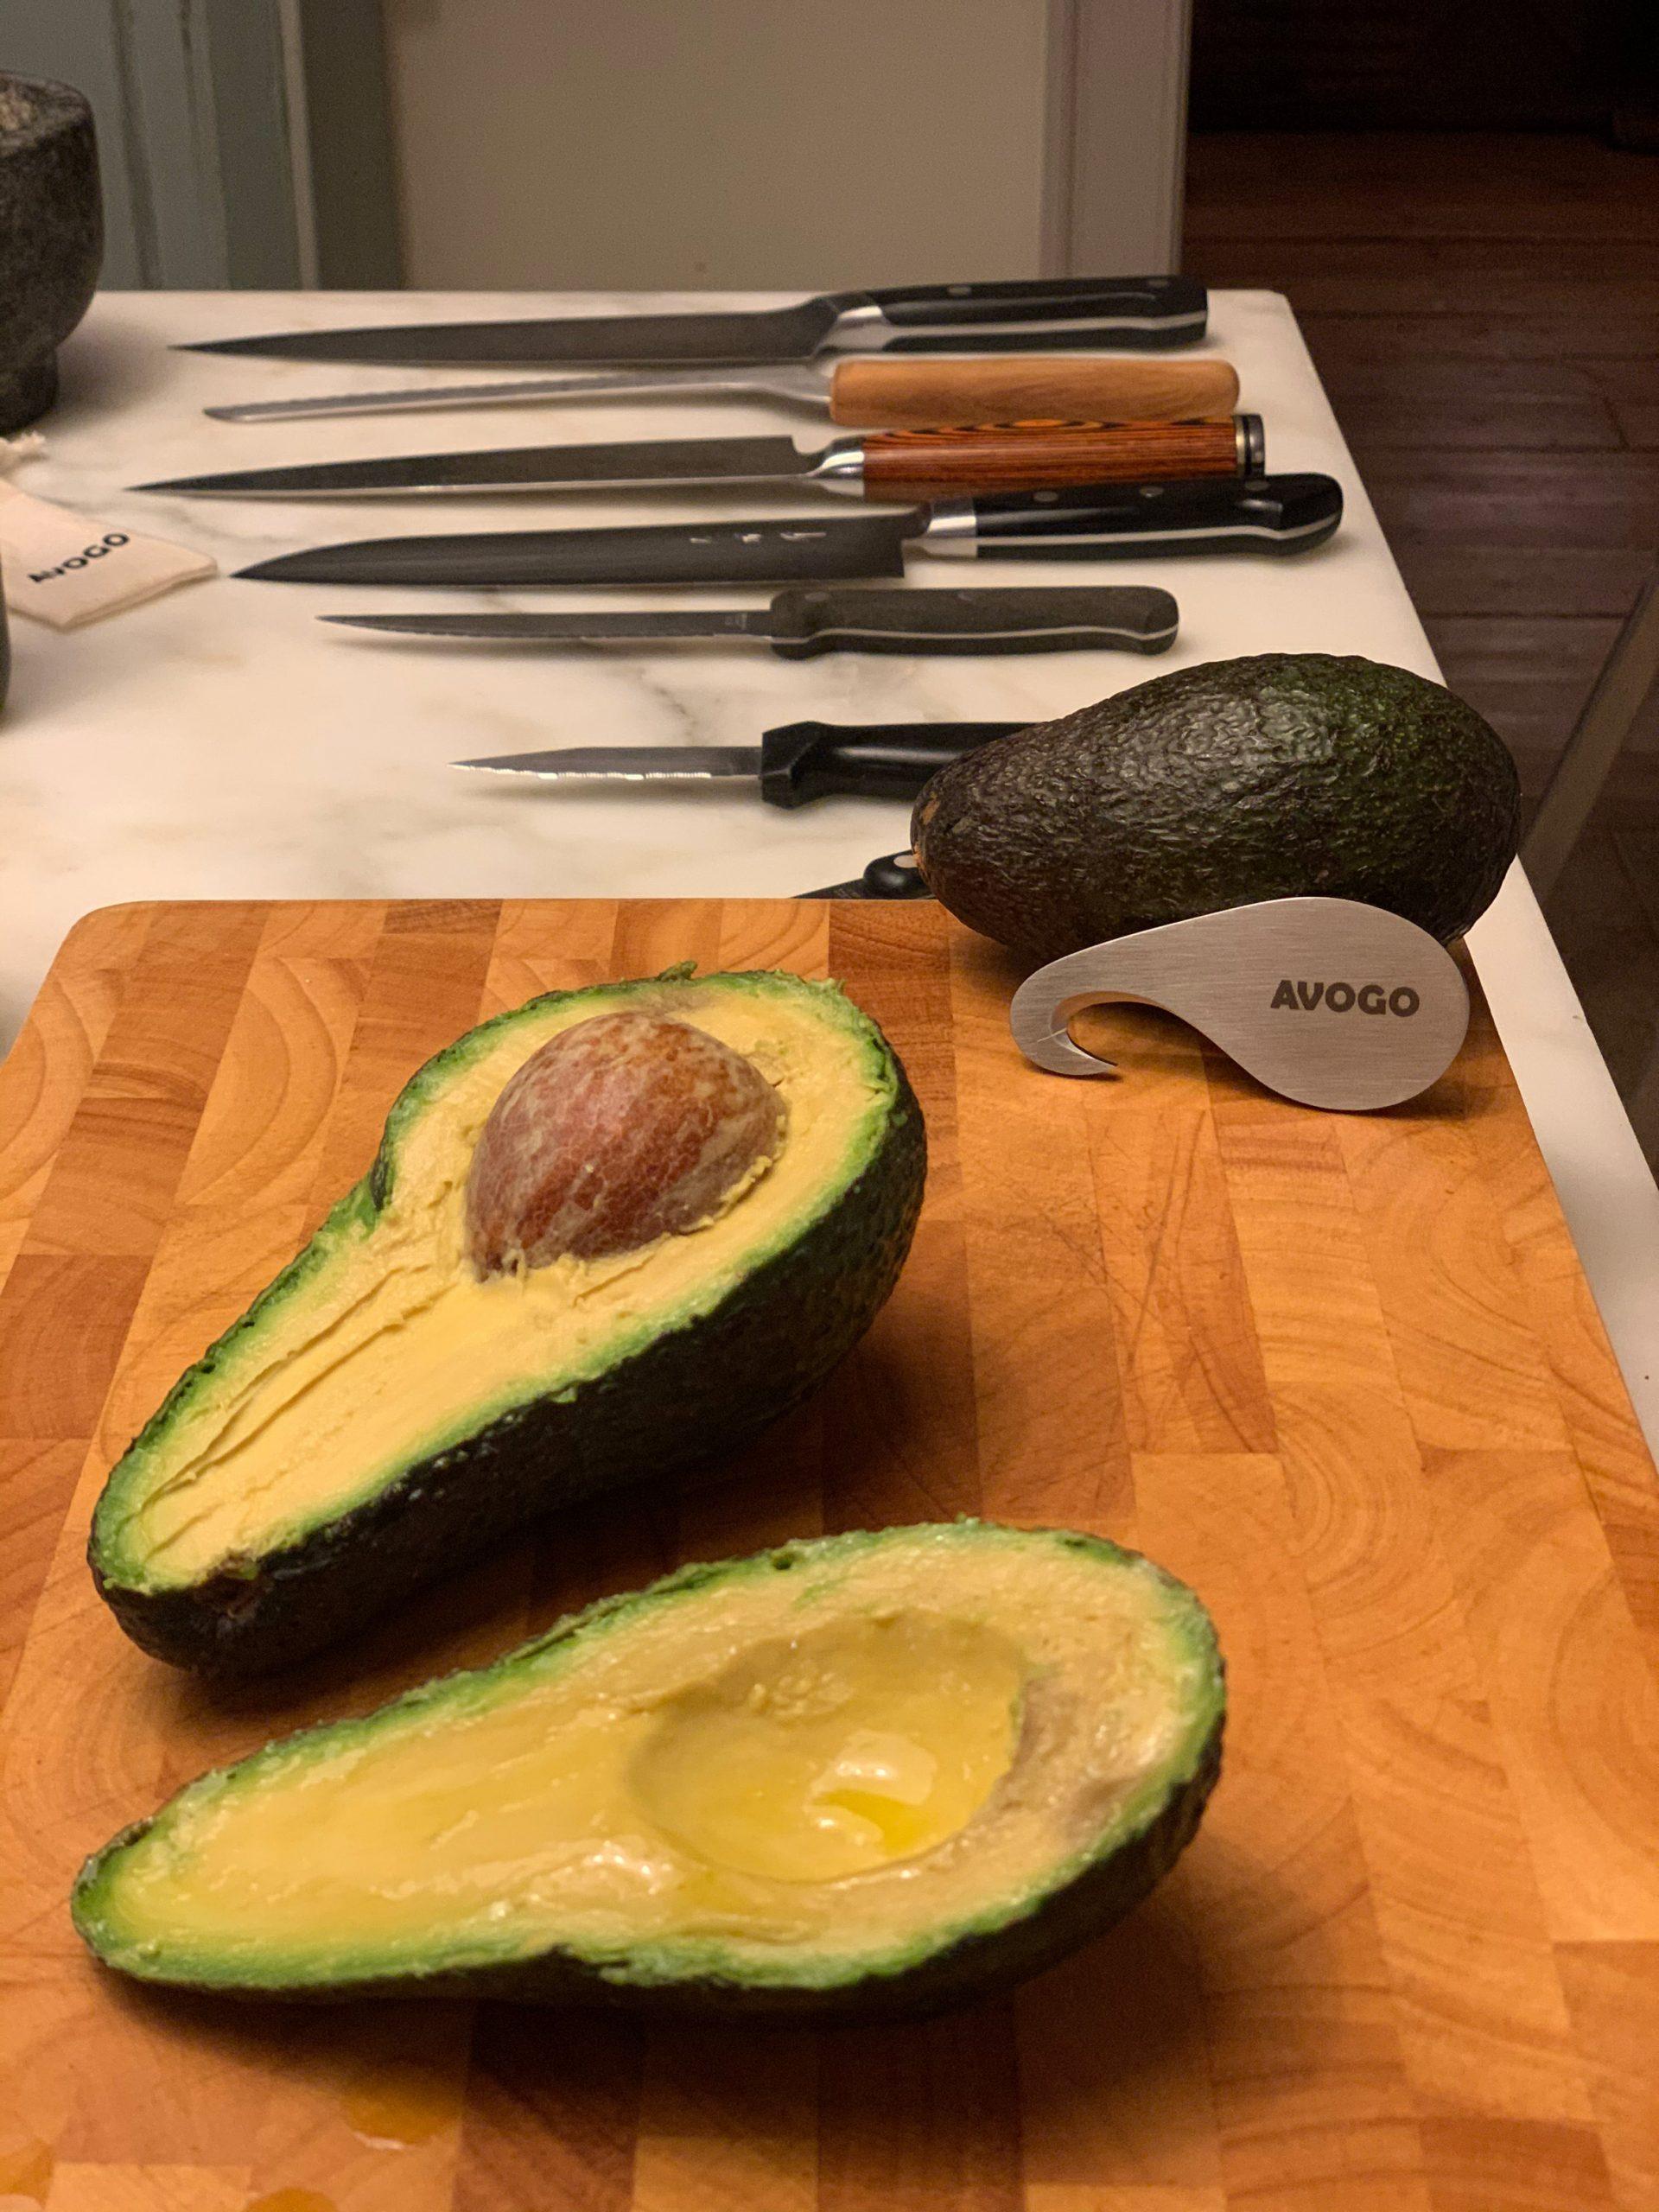 Pietro Pignatti's Avogo tool in a kitchen